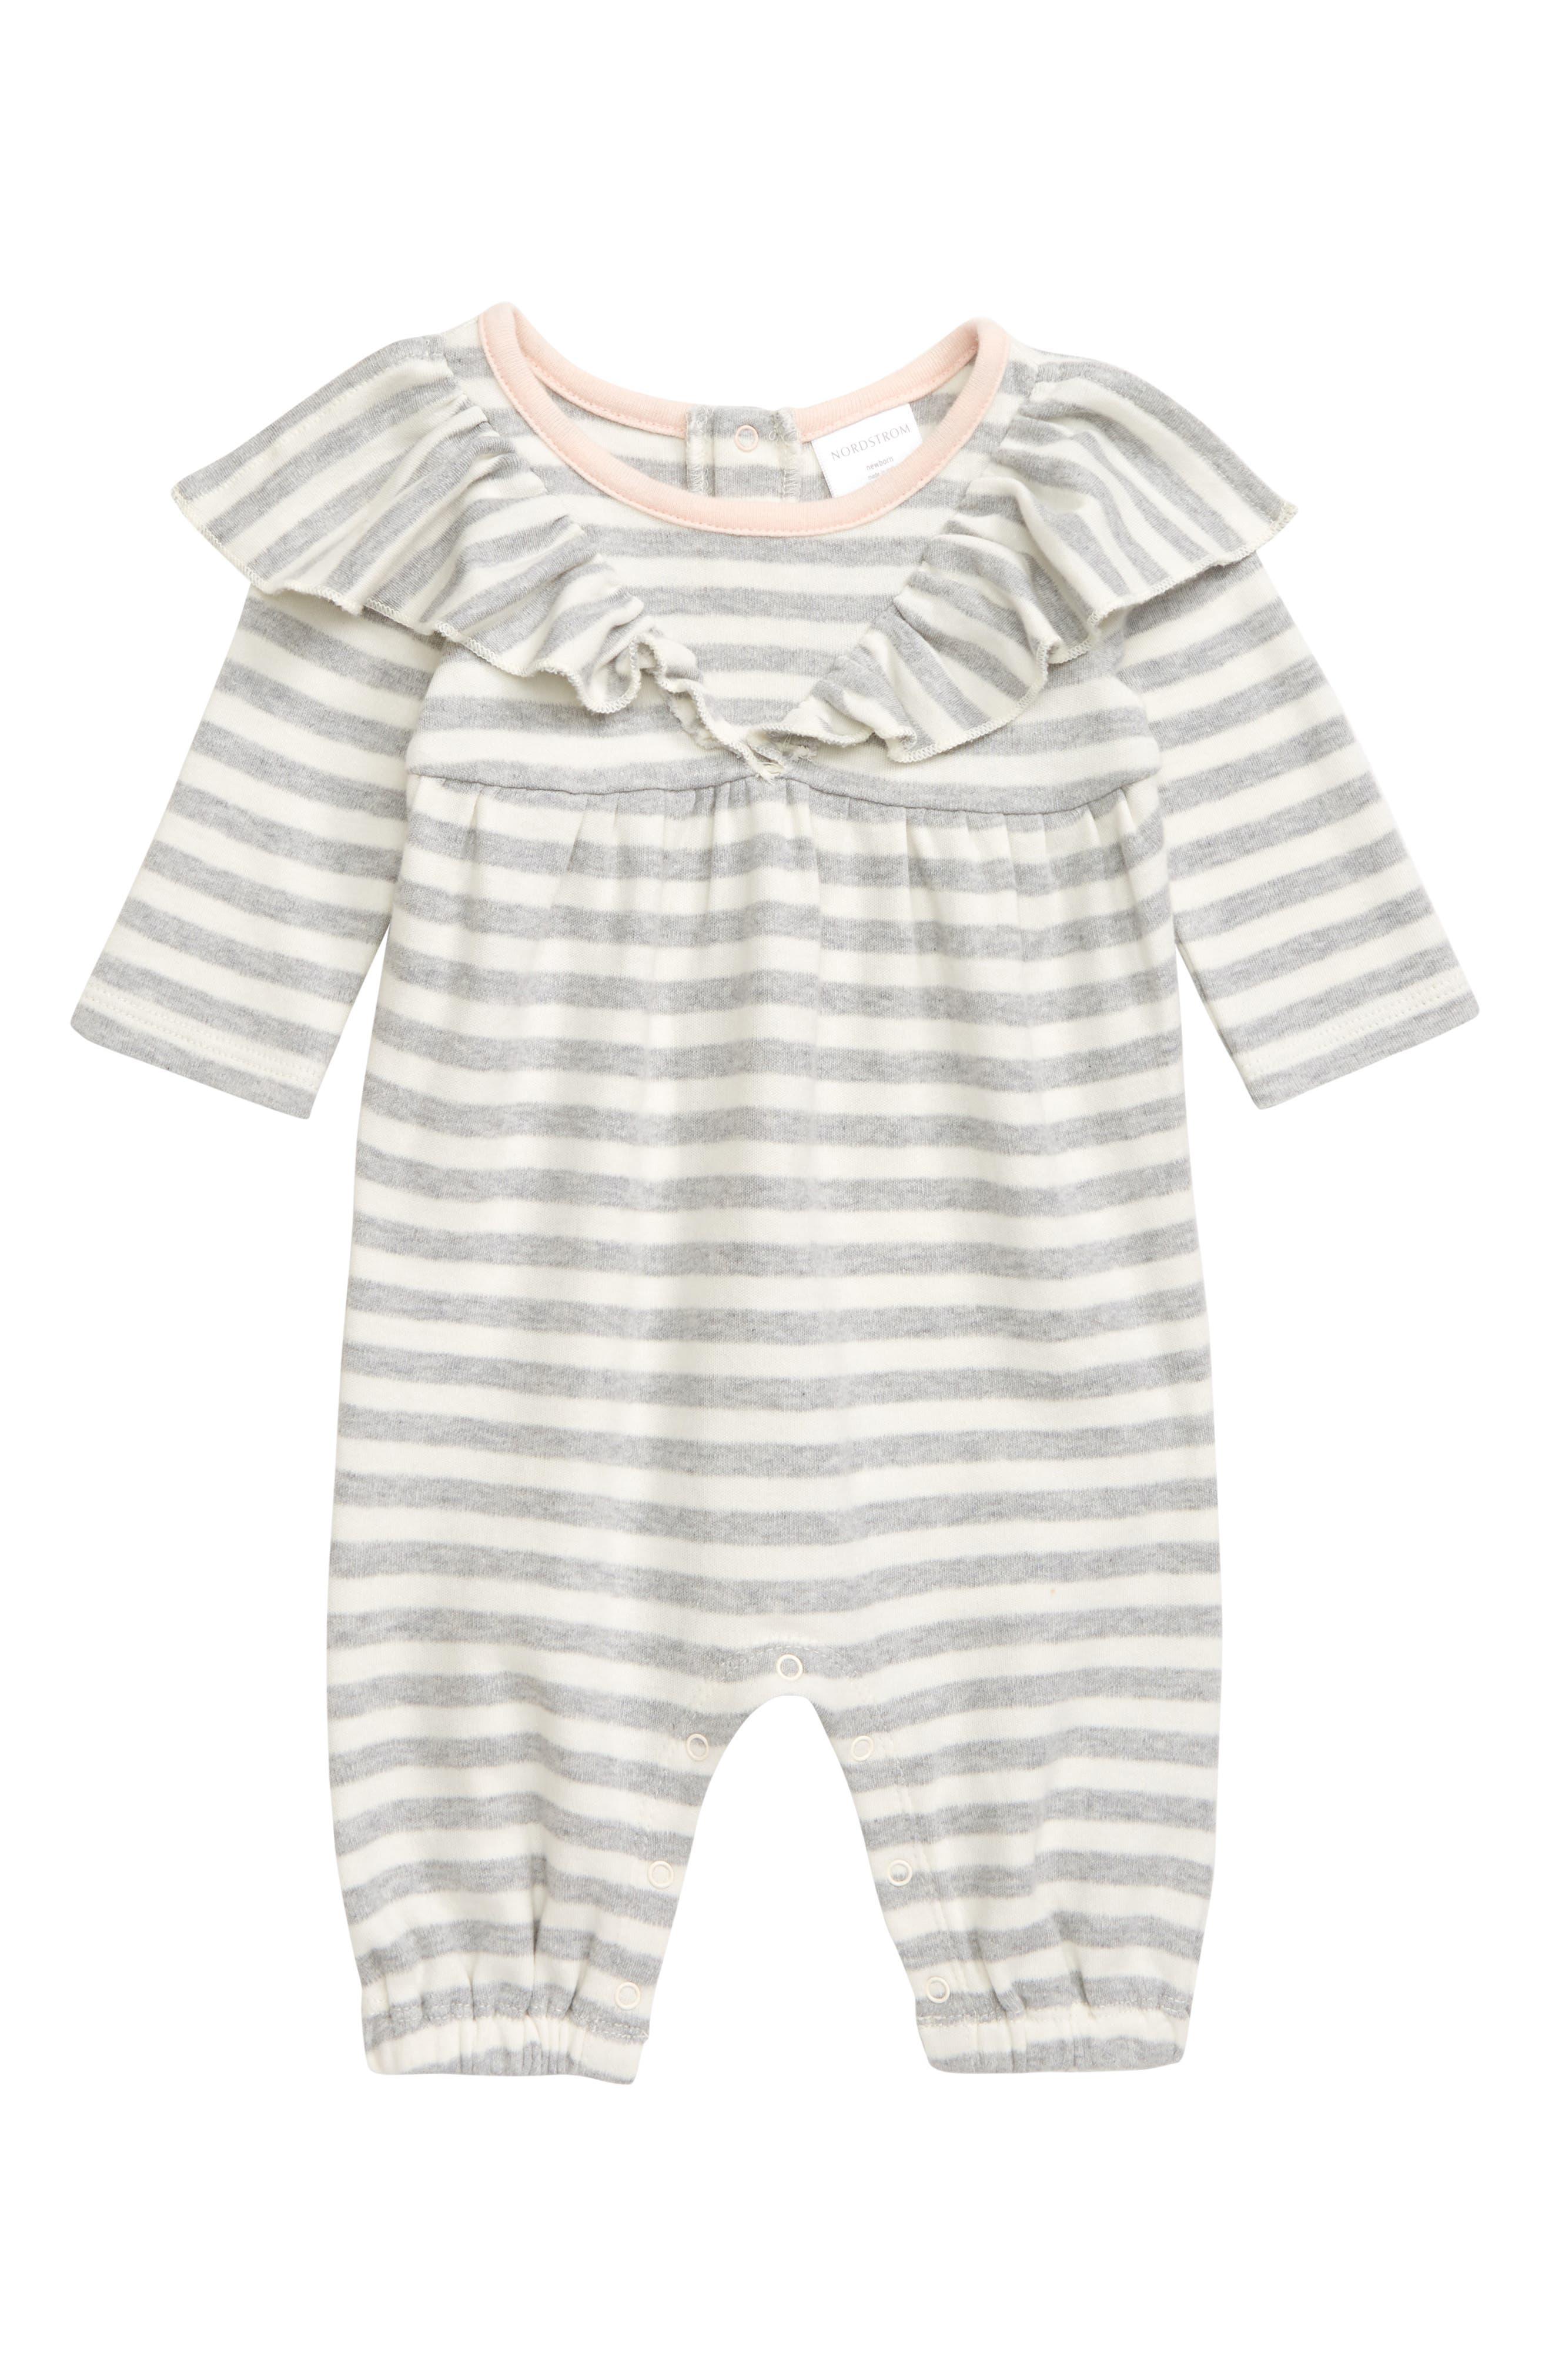 Boys Nordstrom Baby Ruffle Stripe Romper Size 12M  Grey